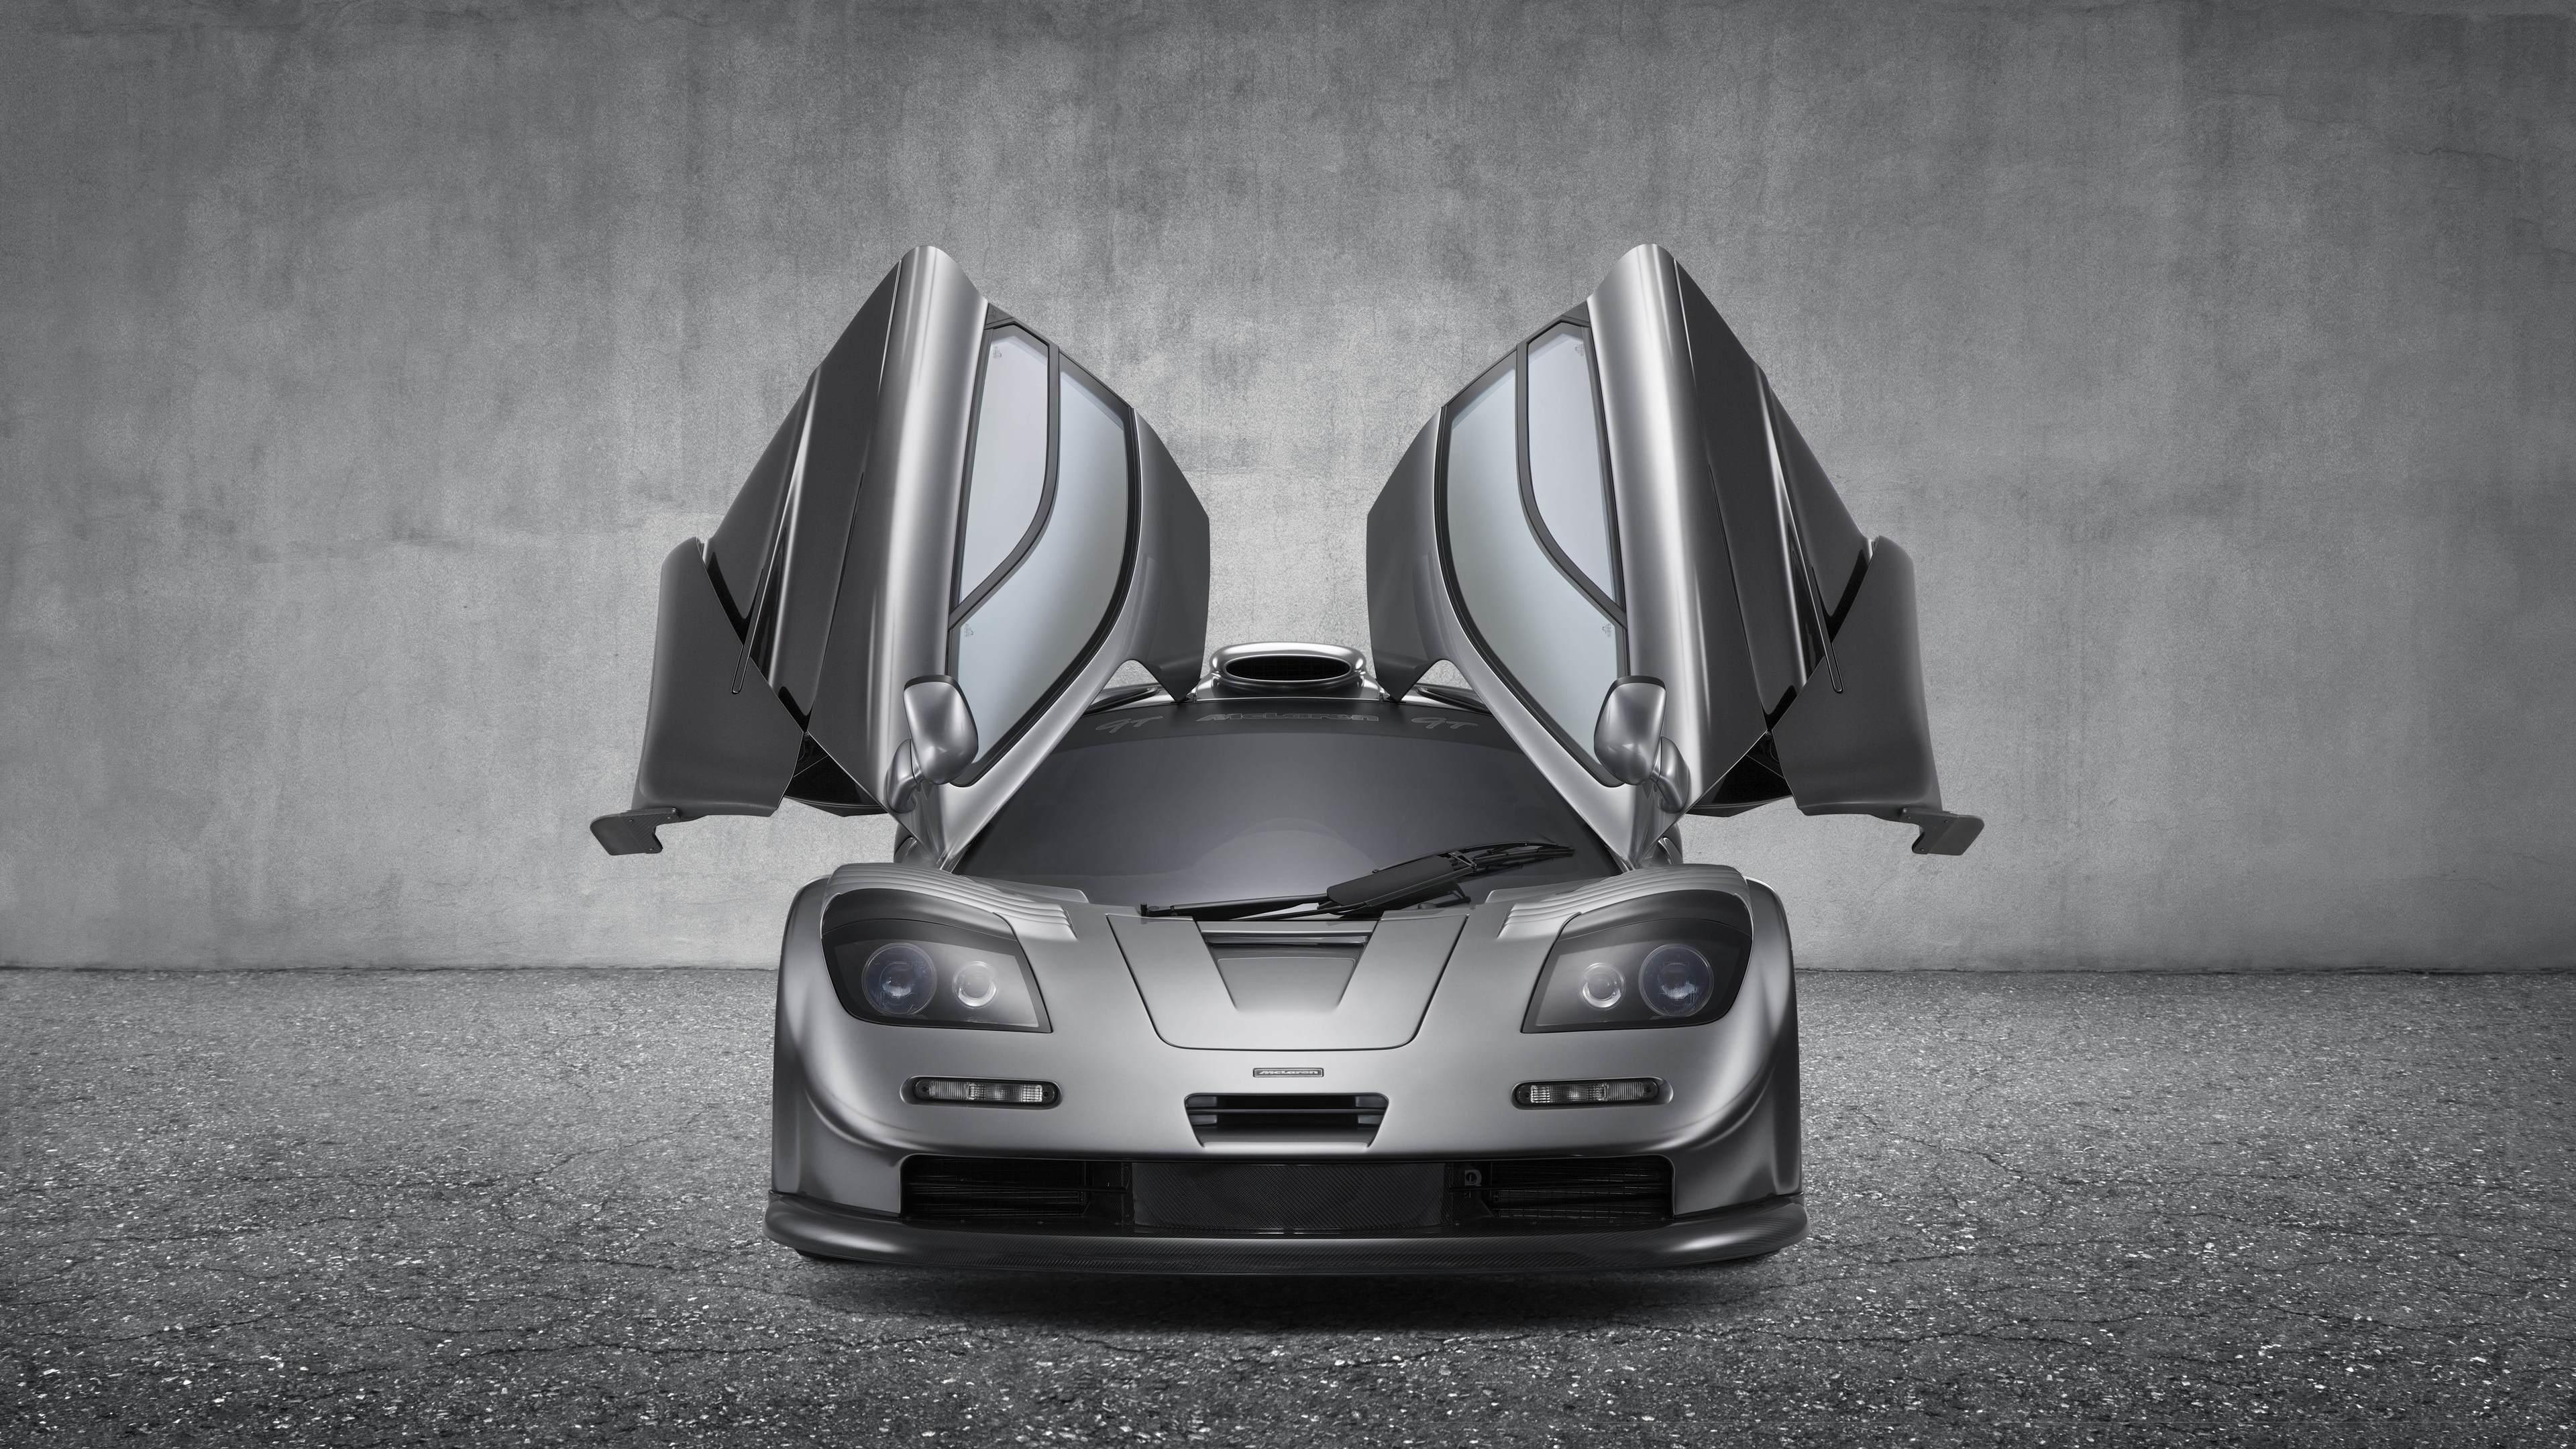 mclaren f1 gt silver 1546362170 - McLaren F1 GT Silver - mclaren wallpapers, hd-wallpapers, cars wallpapers, 4k-wallpapers